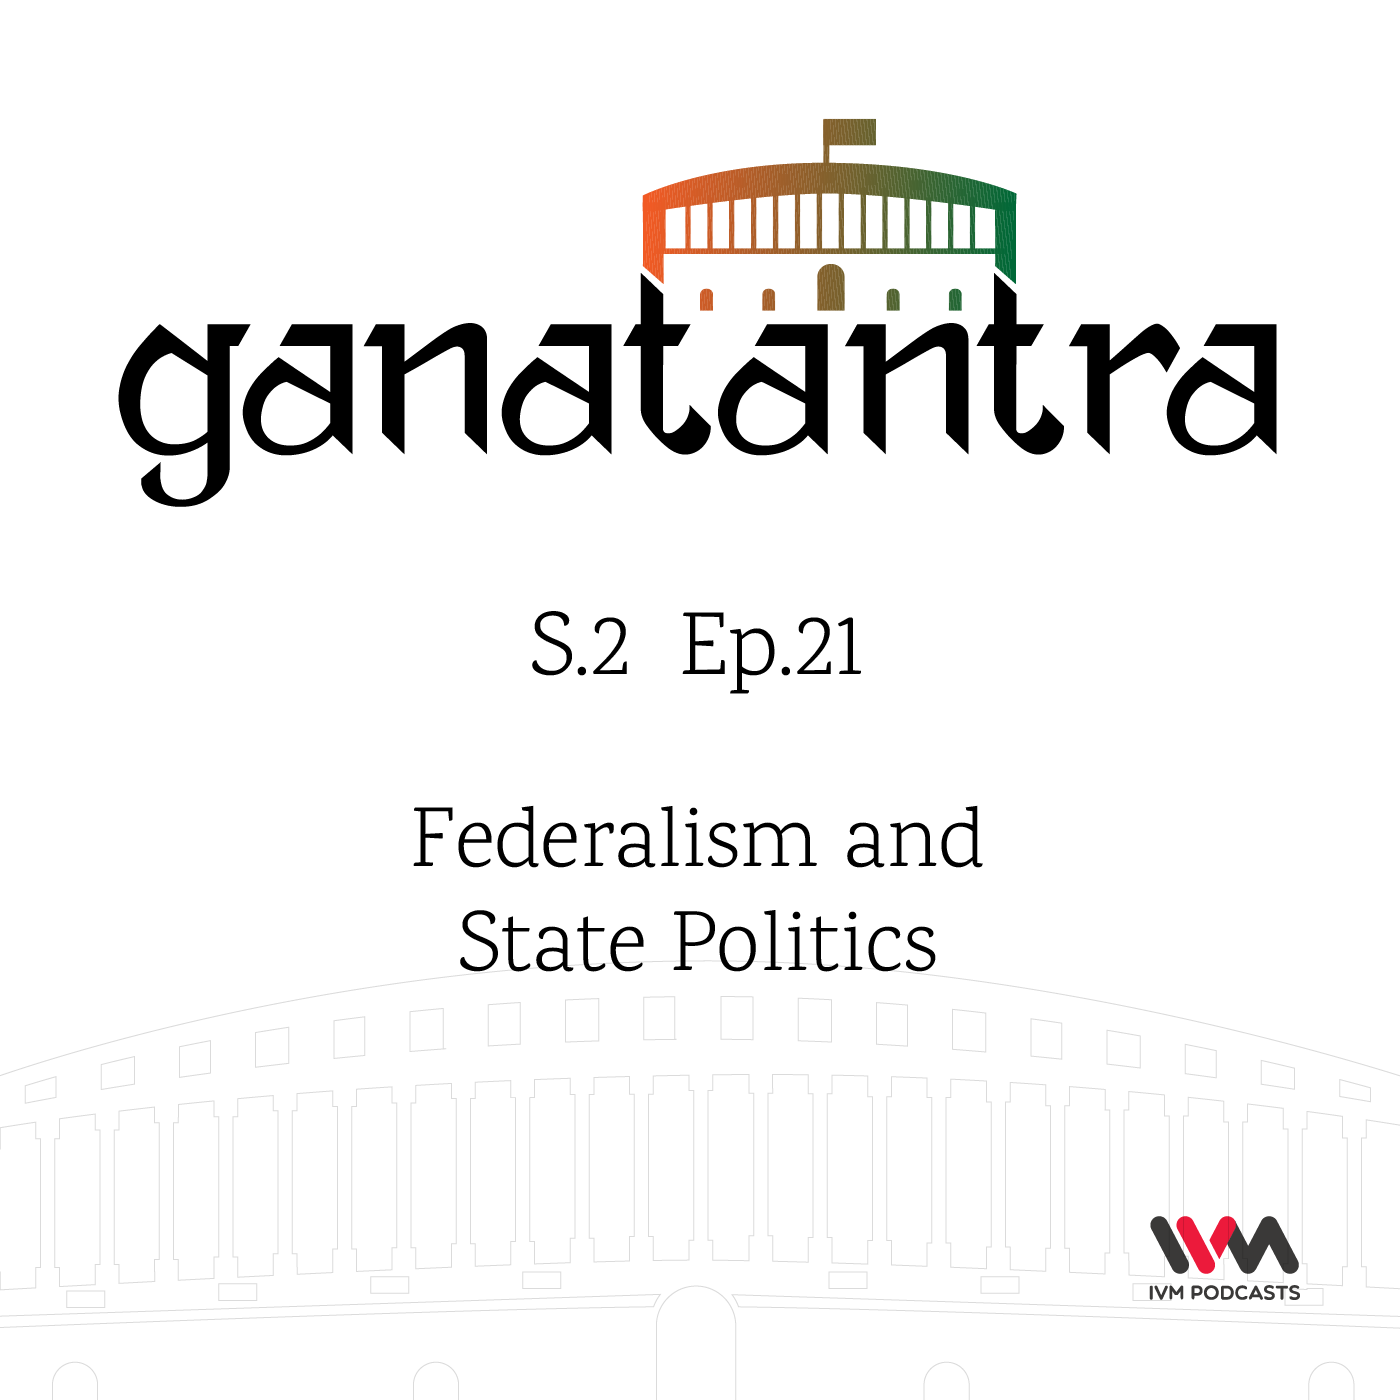 S02 E21: Federalism and State Politics